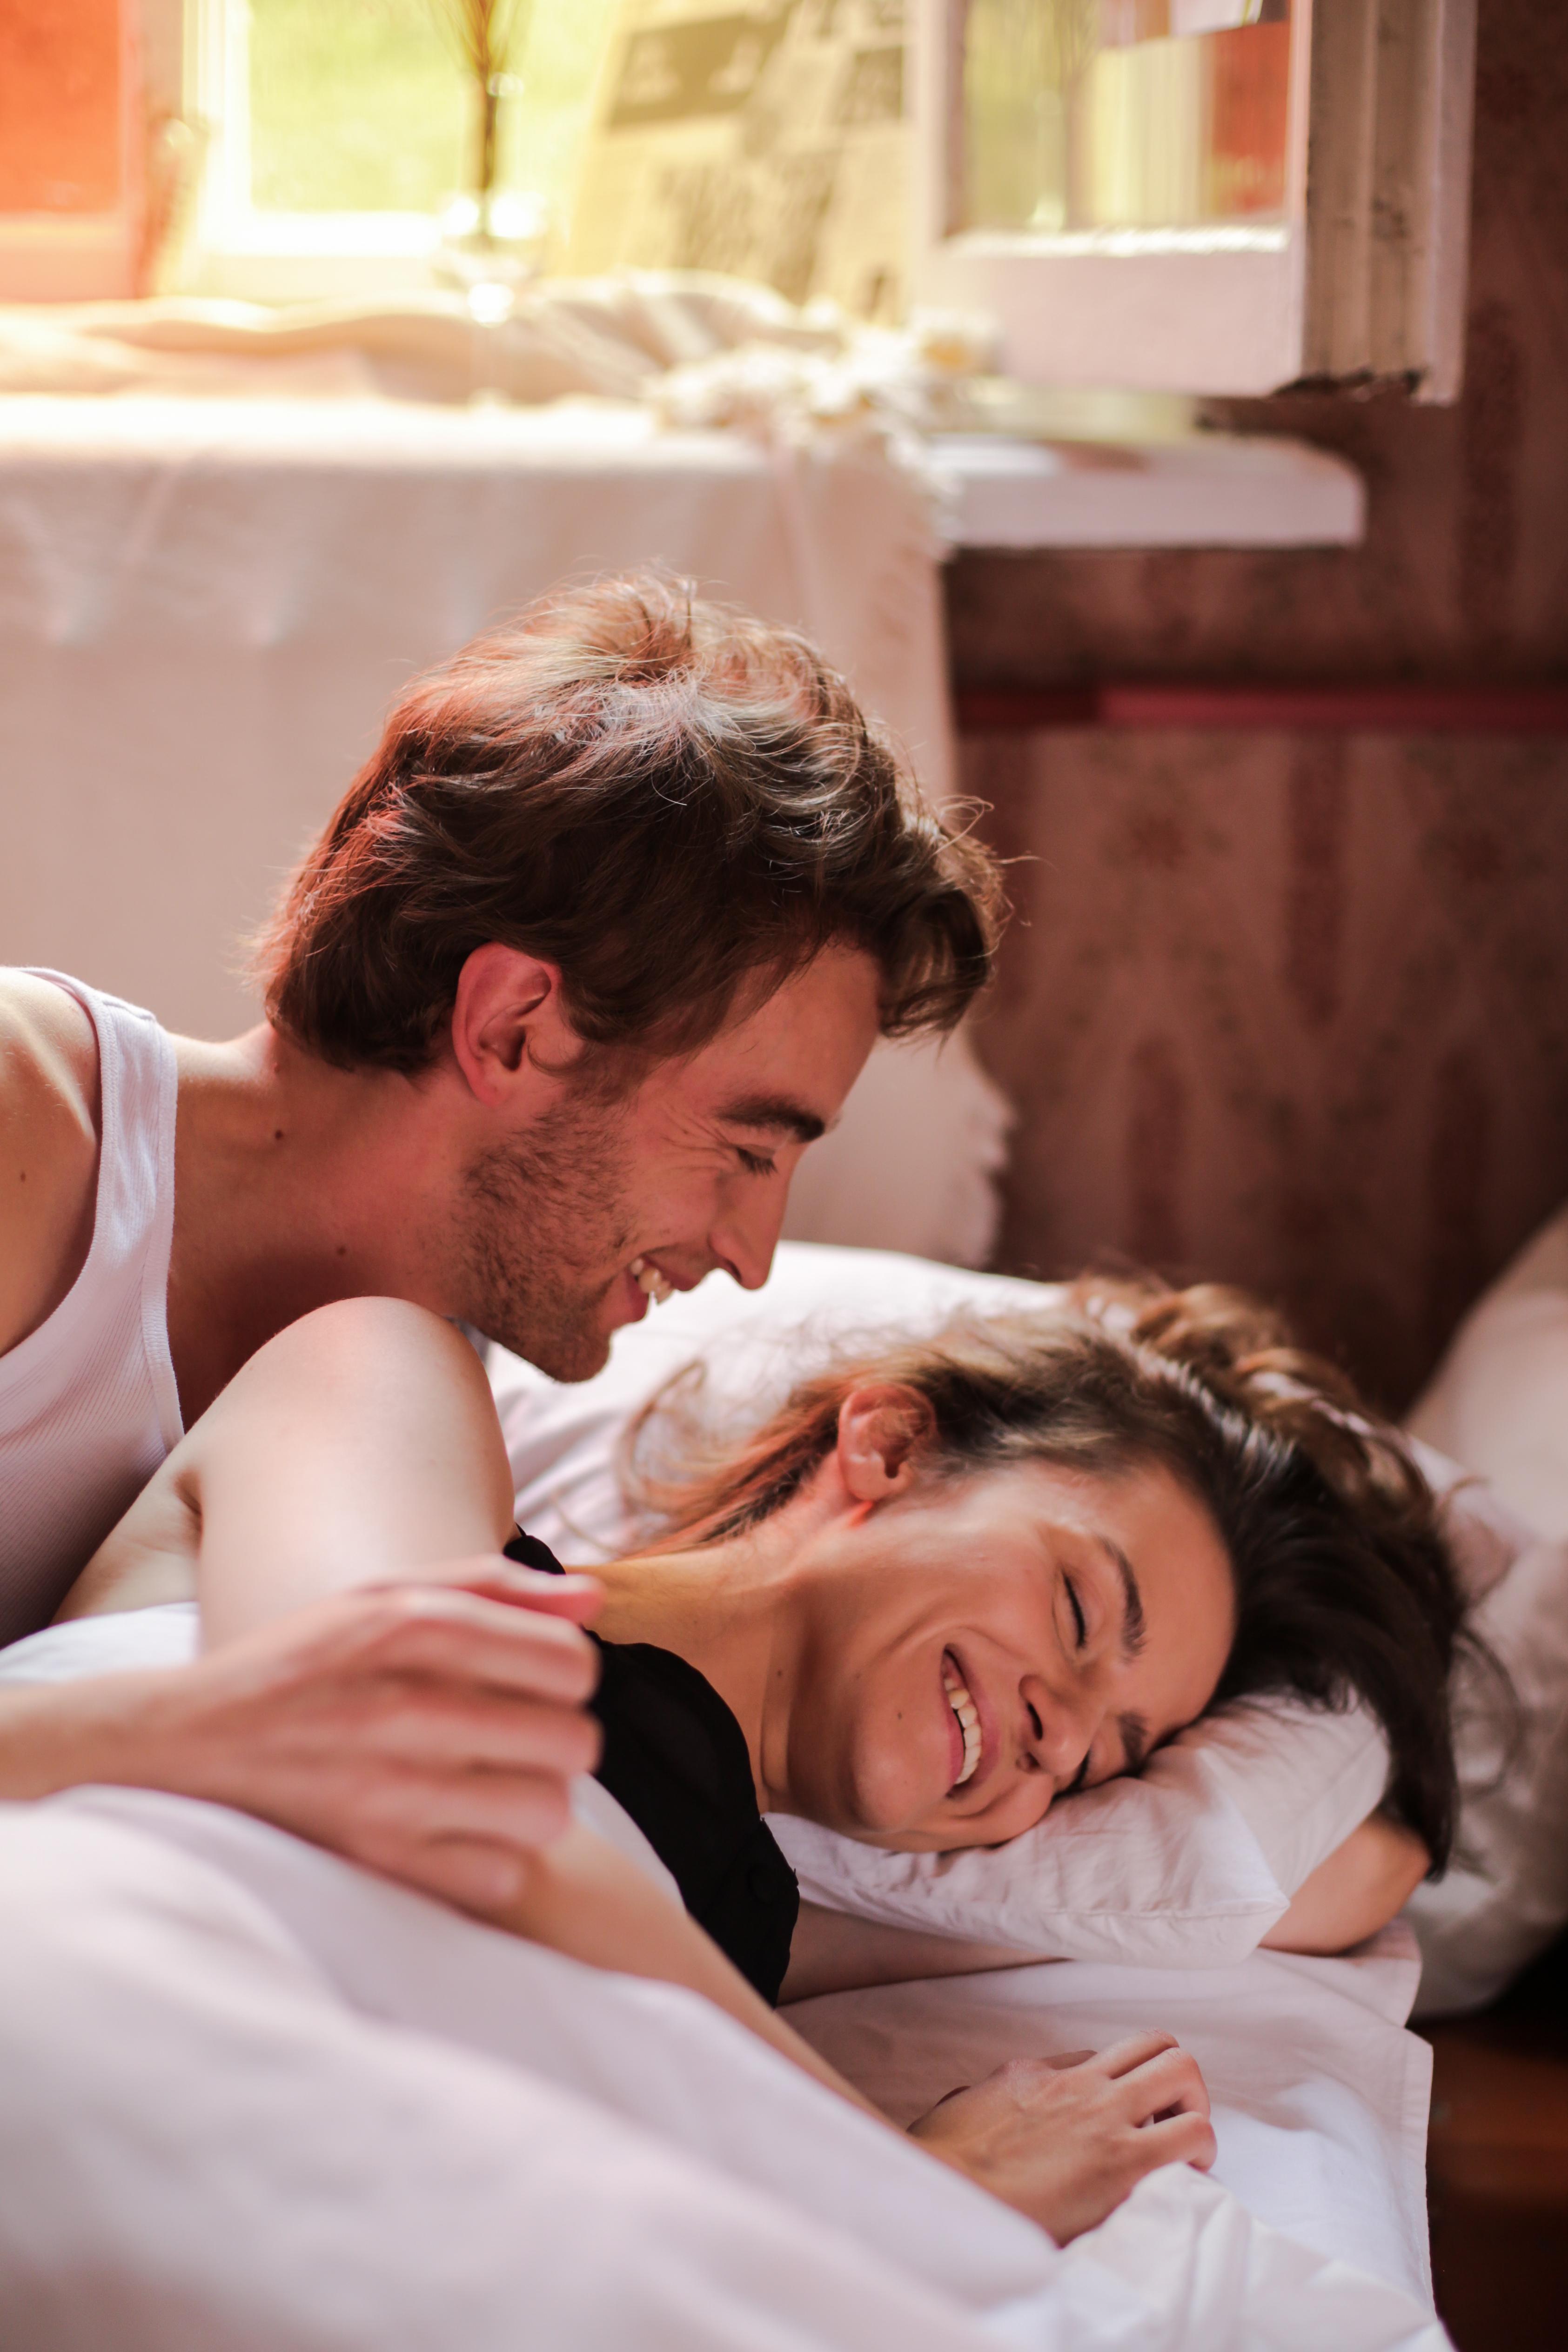 man in white tank top kissing woman in black tank top